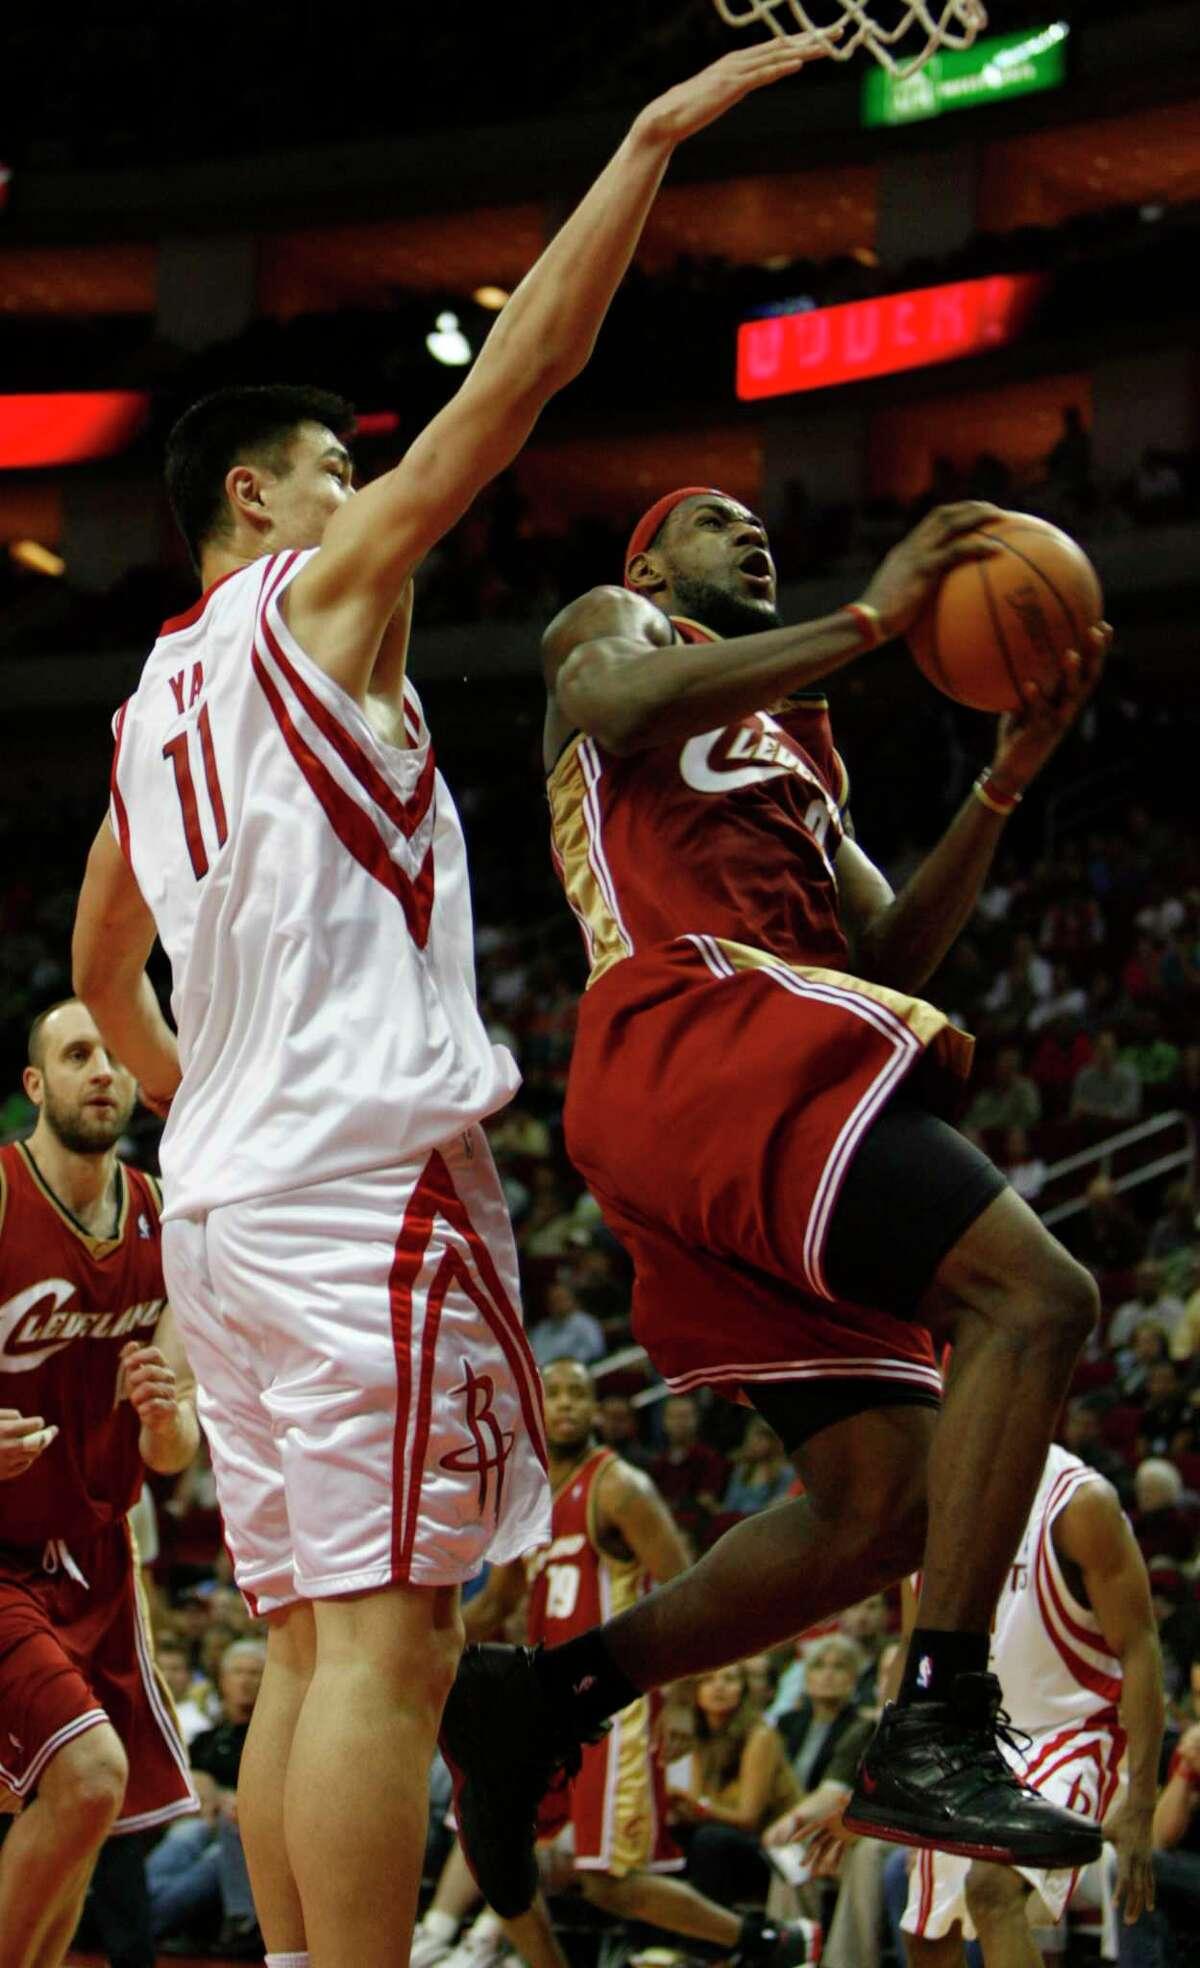 March 26, 2006: Rockets 104, Cavaliers 102 (OT) Points: 36 Rebounds: 6 Assists: 5